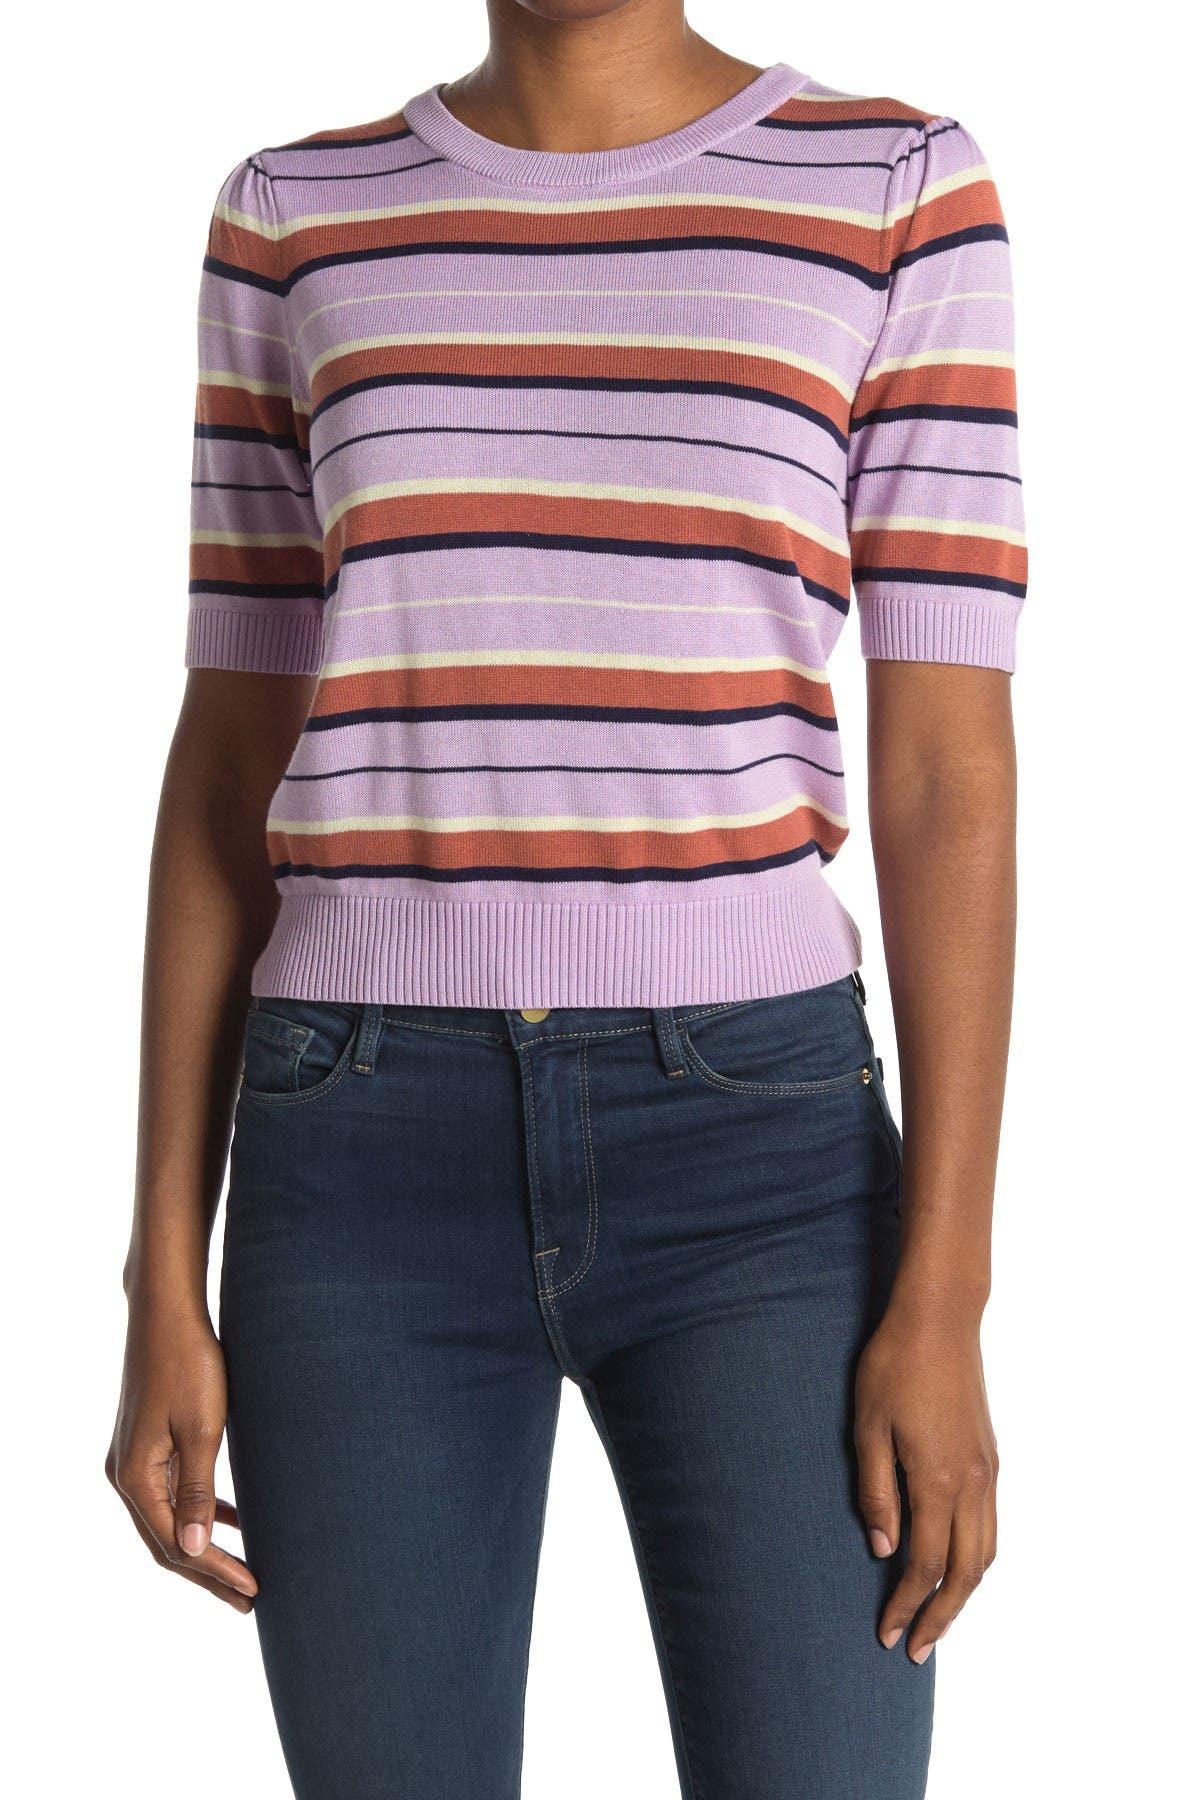 Image of Heartloom Stripe Short Sleeve Knit Sweater